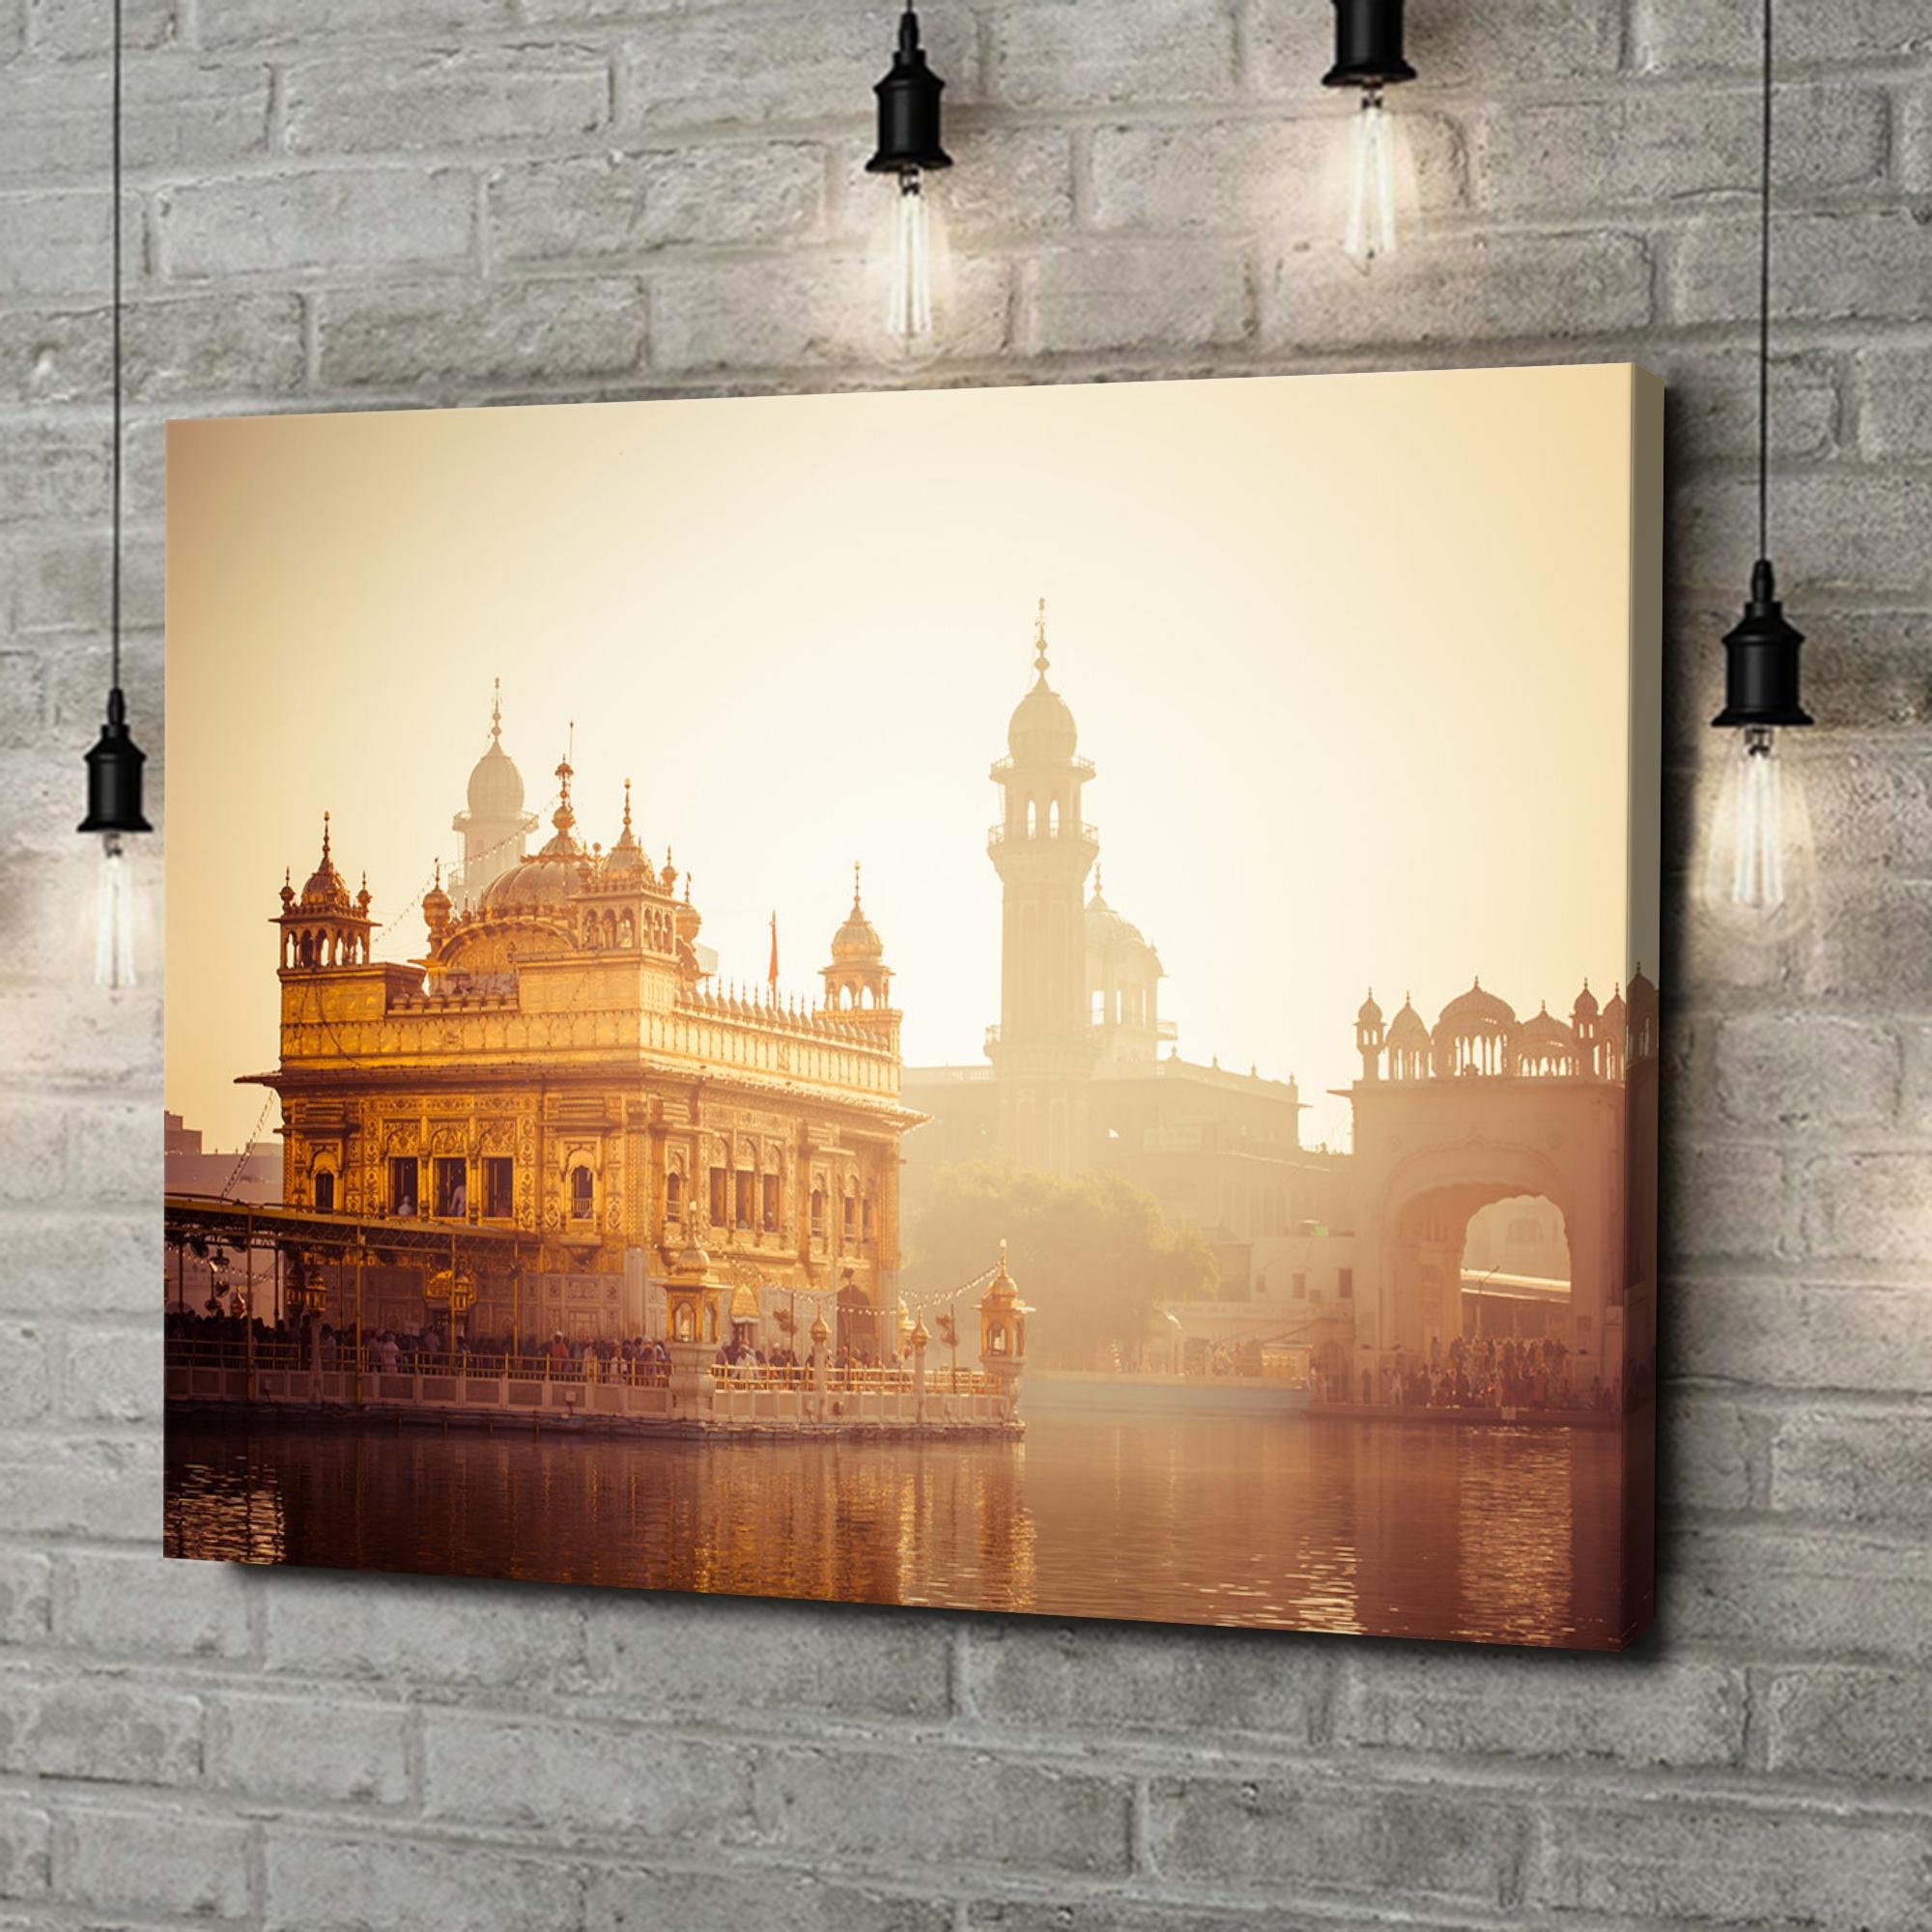 Leinwandbild personalisiert Sikh Gurdwara Goldener Tempel Punjab Indien